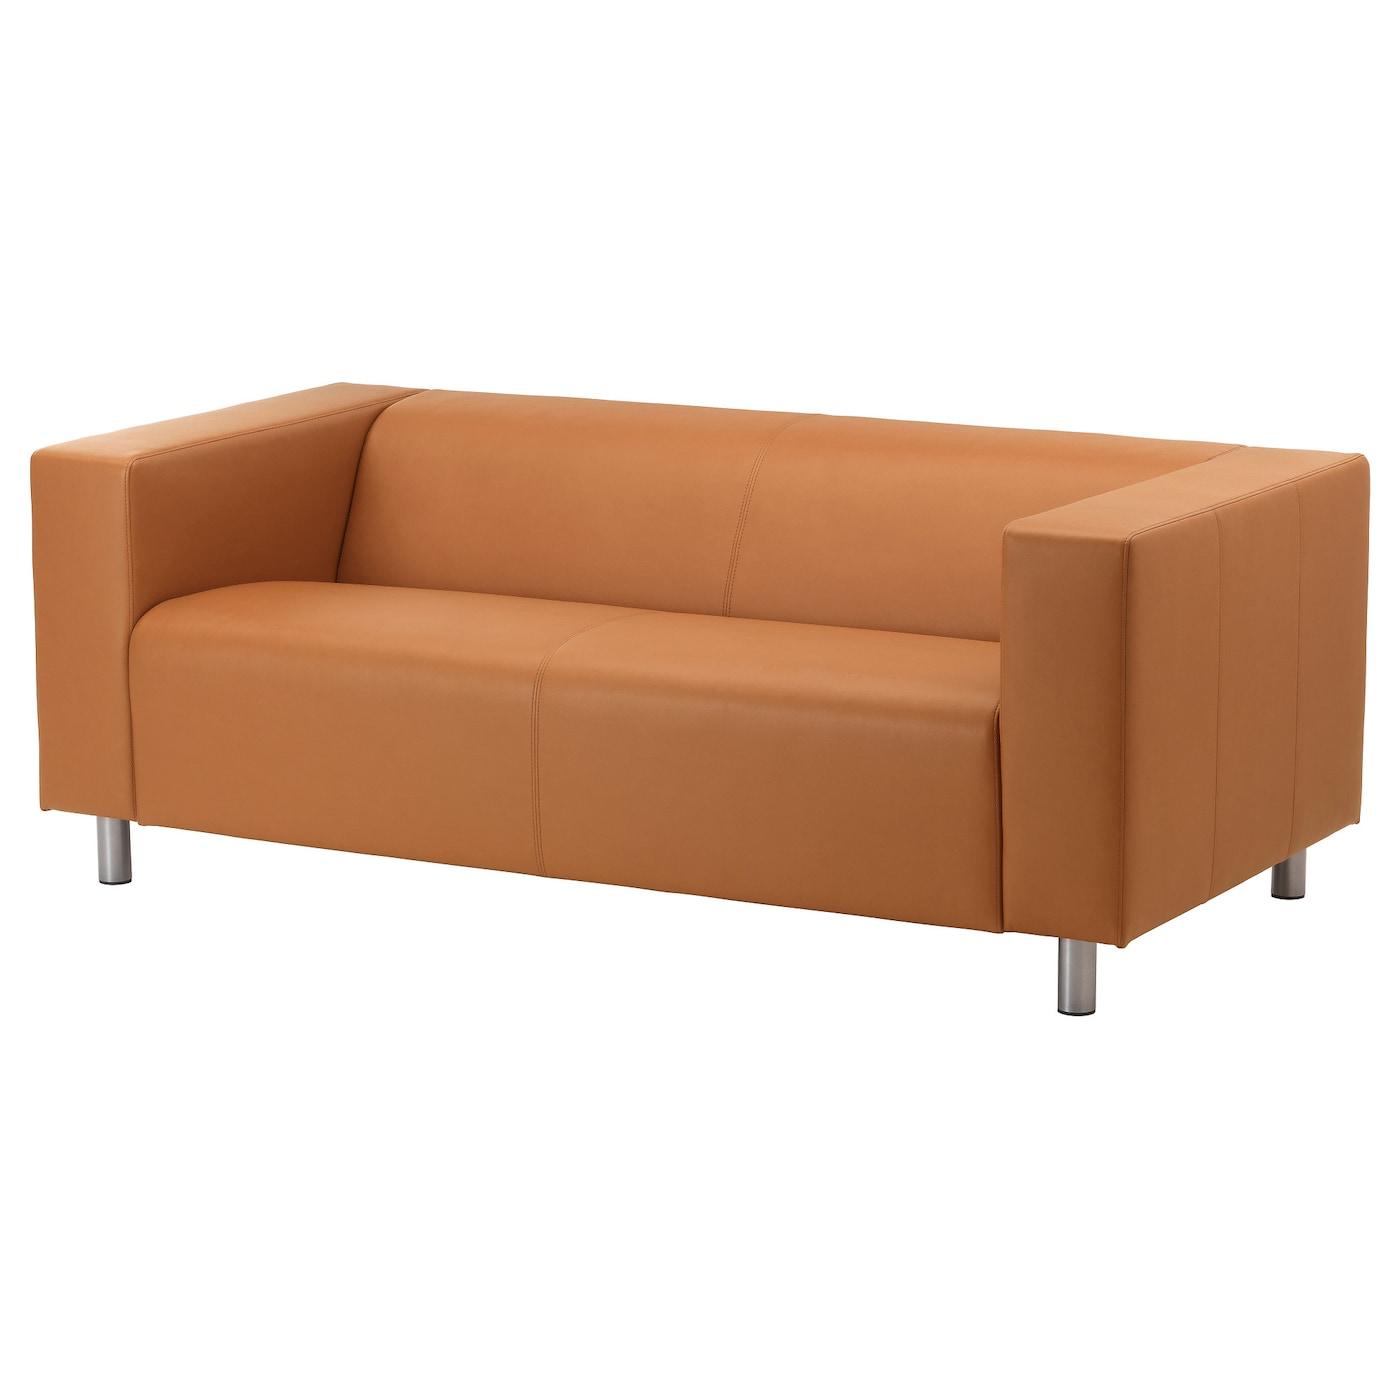 Klippan two seat sofa kimstad light brown ikea for Italienisches sofa